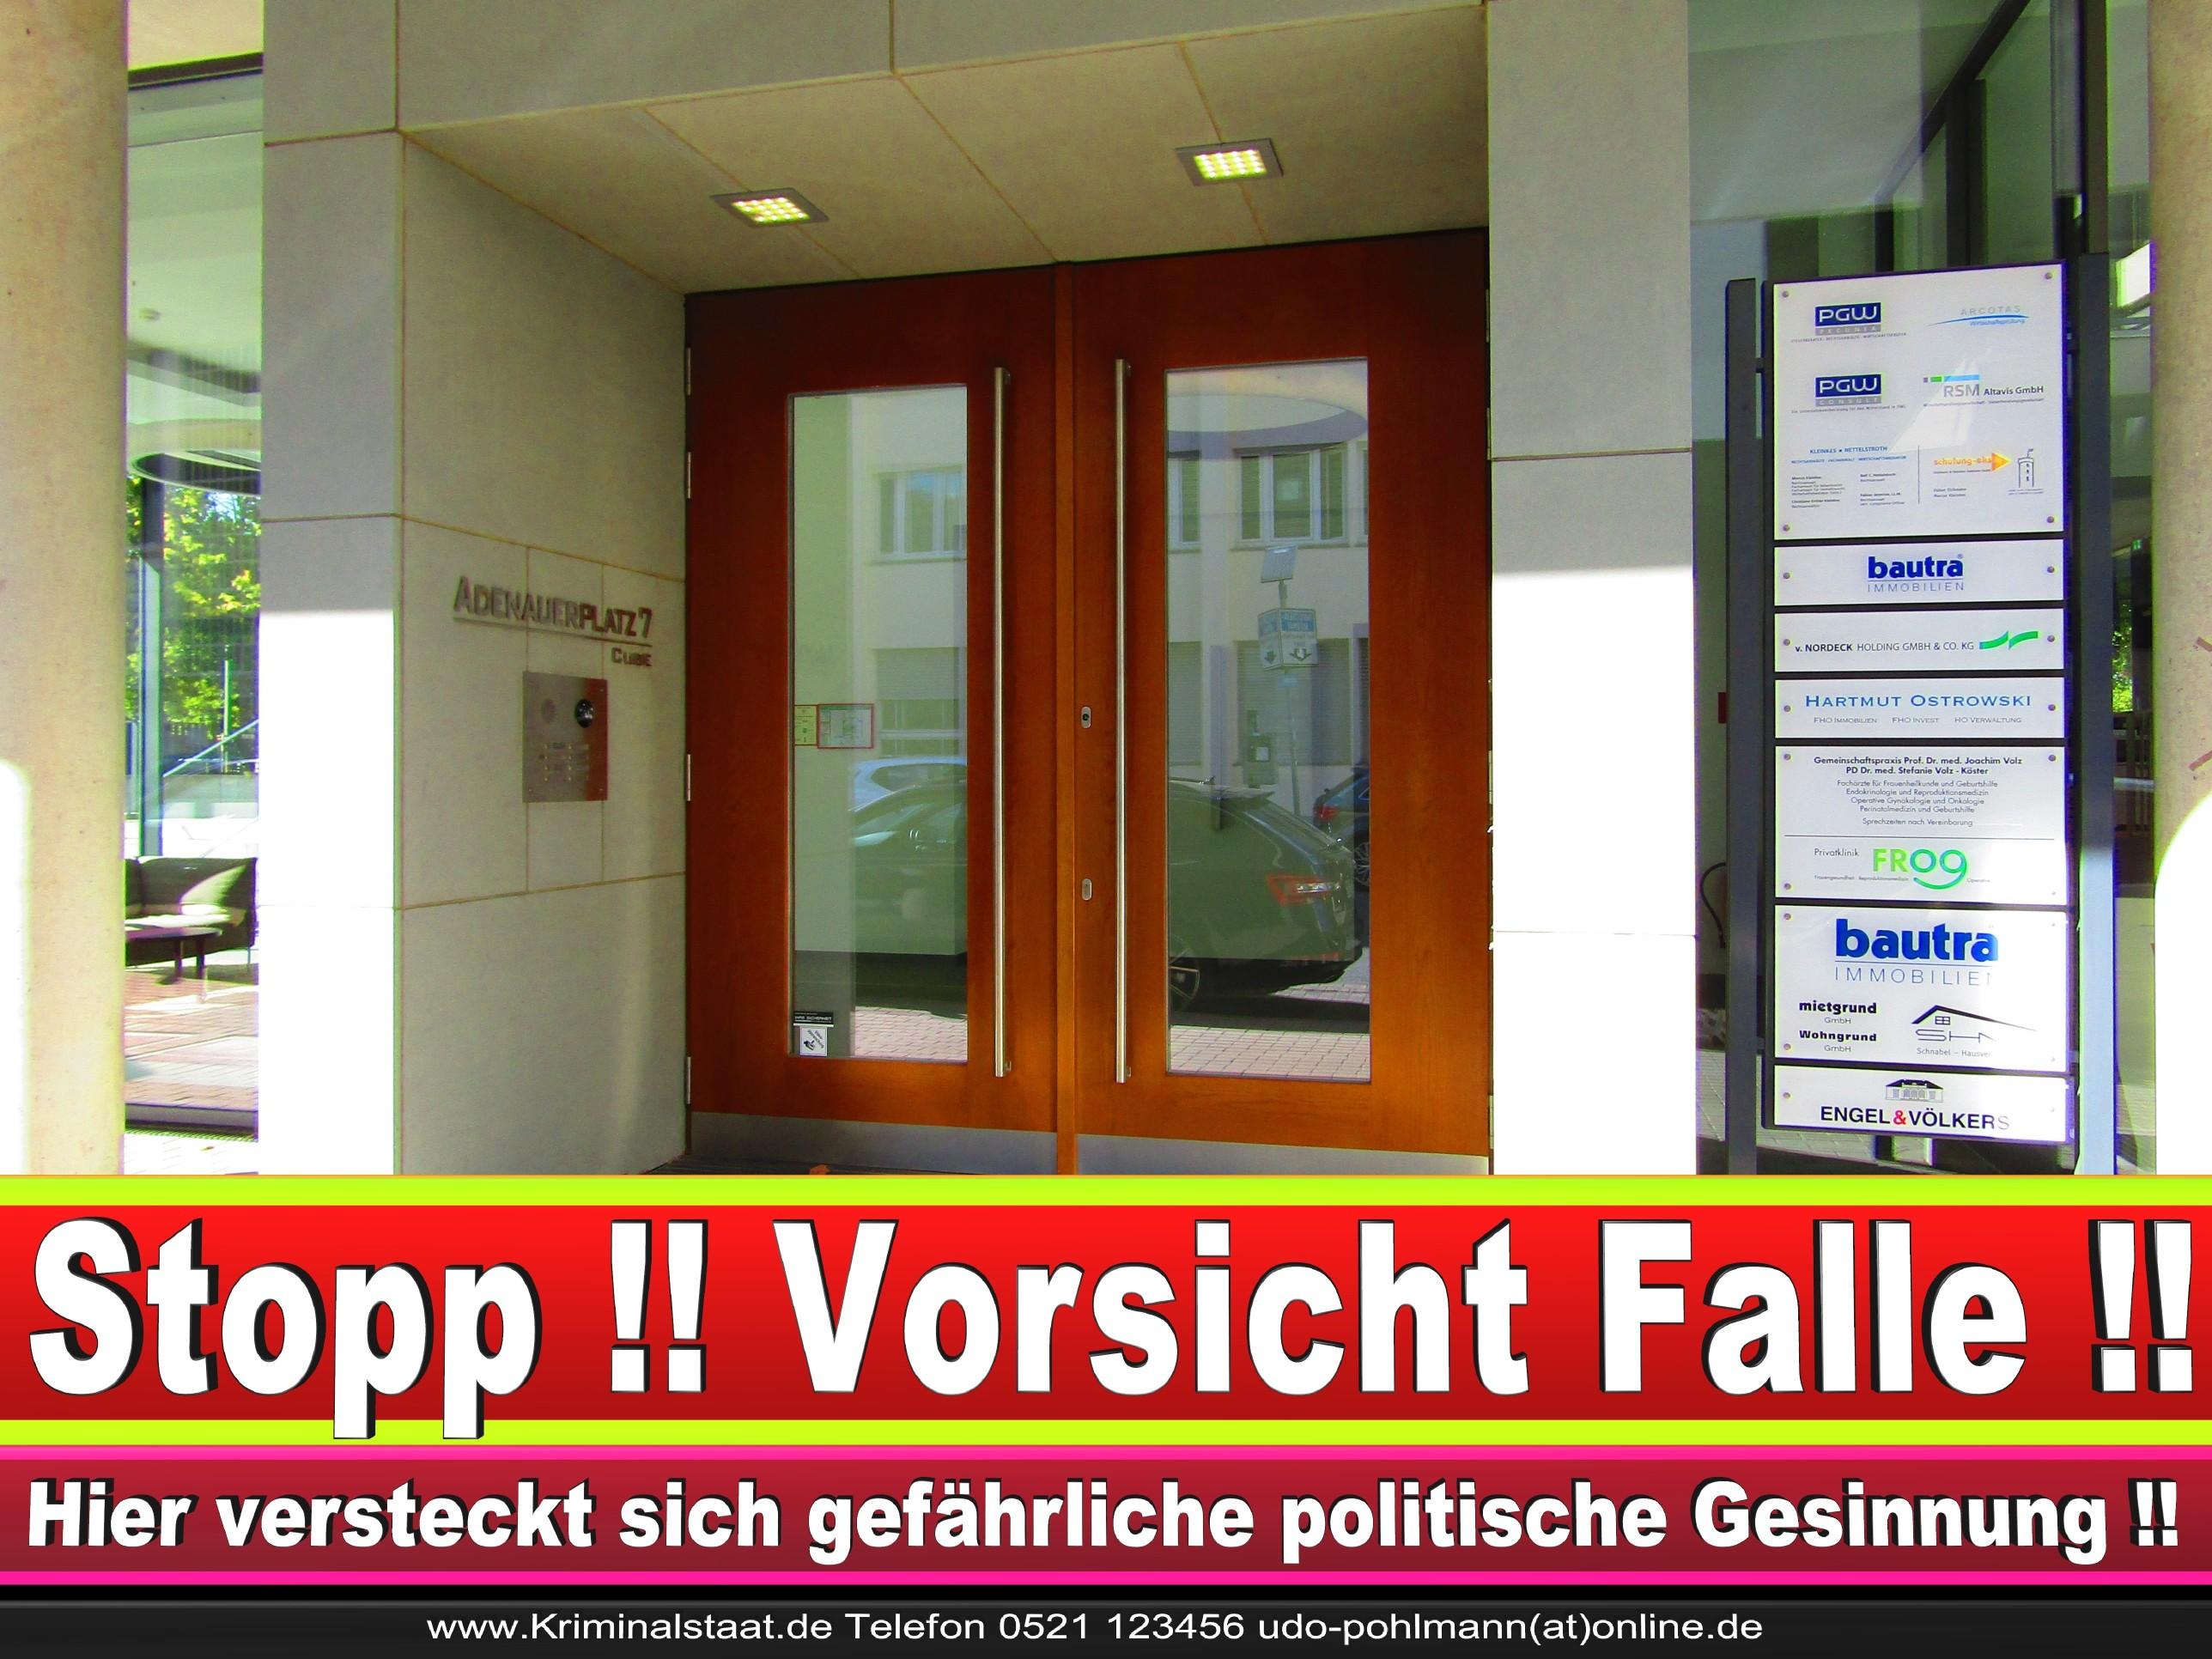 Rechtsanwalt Marcus Kleinkes Adenauer Platz 7 Bielefeld CDU 4